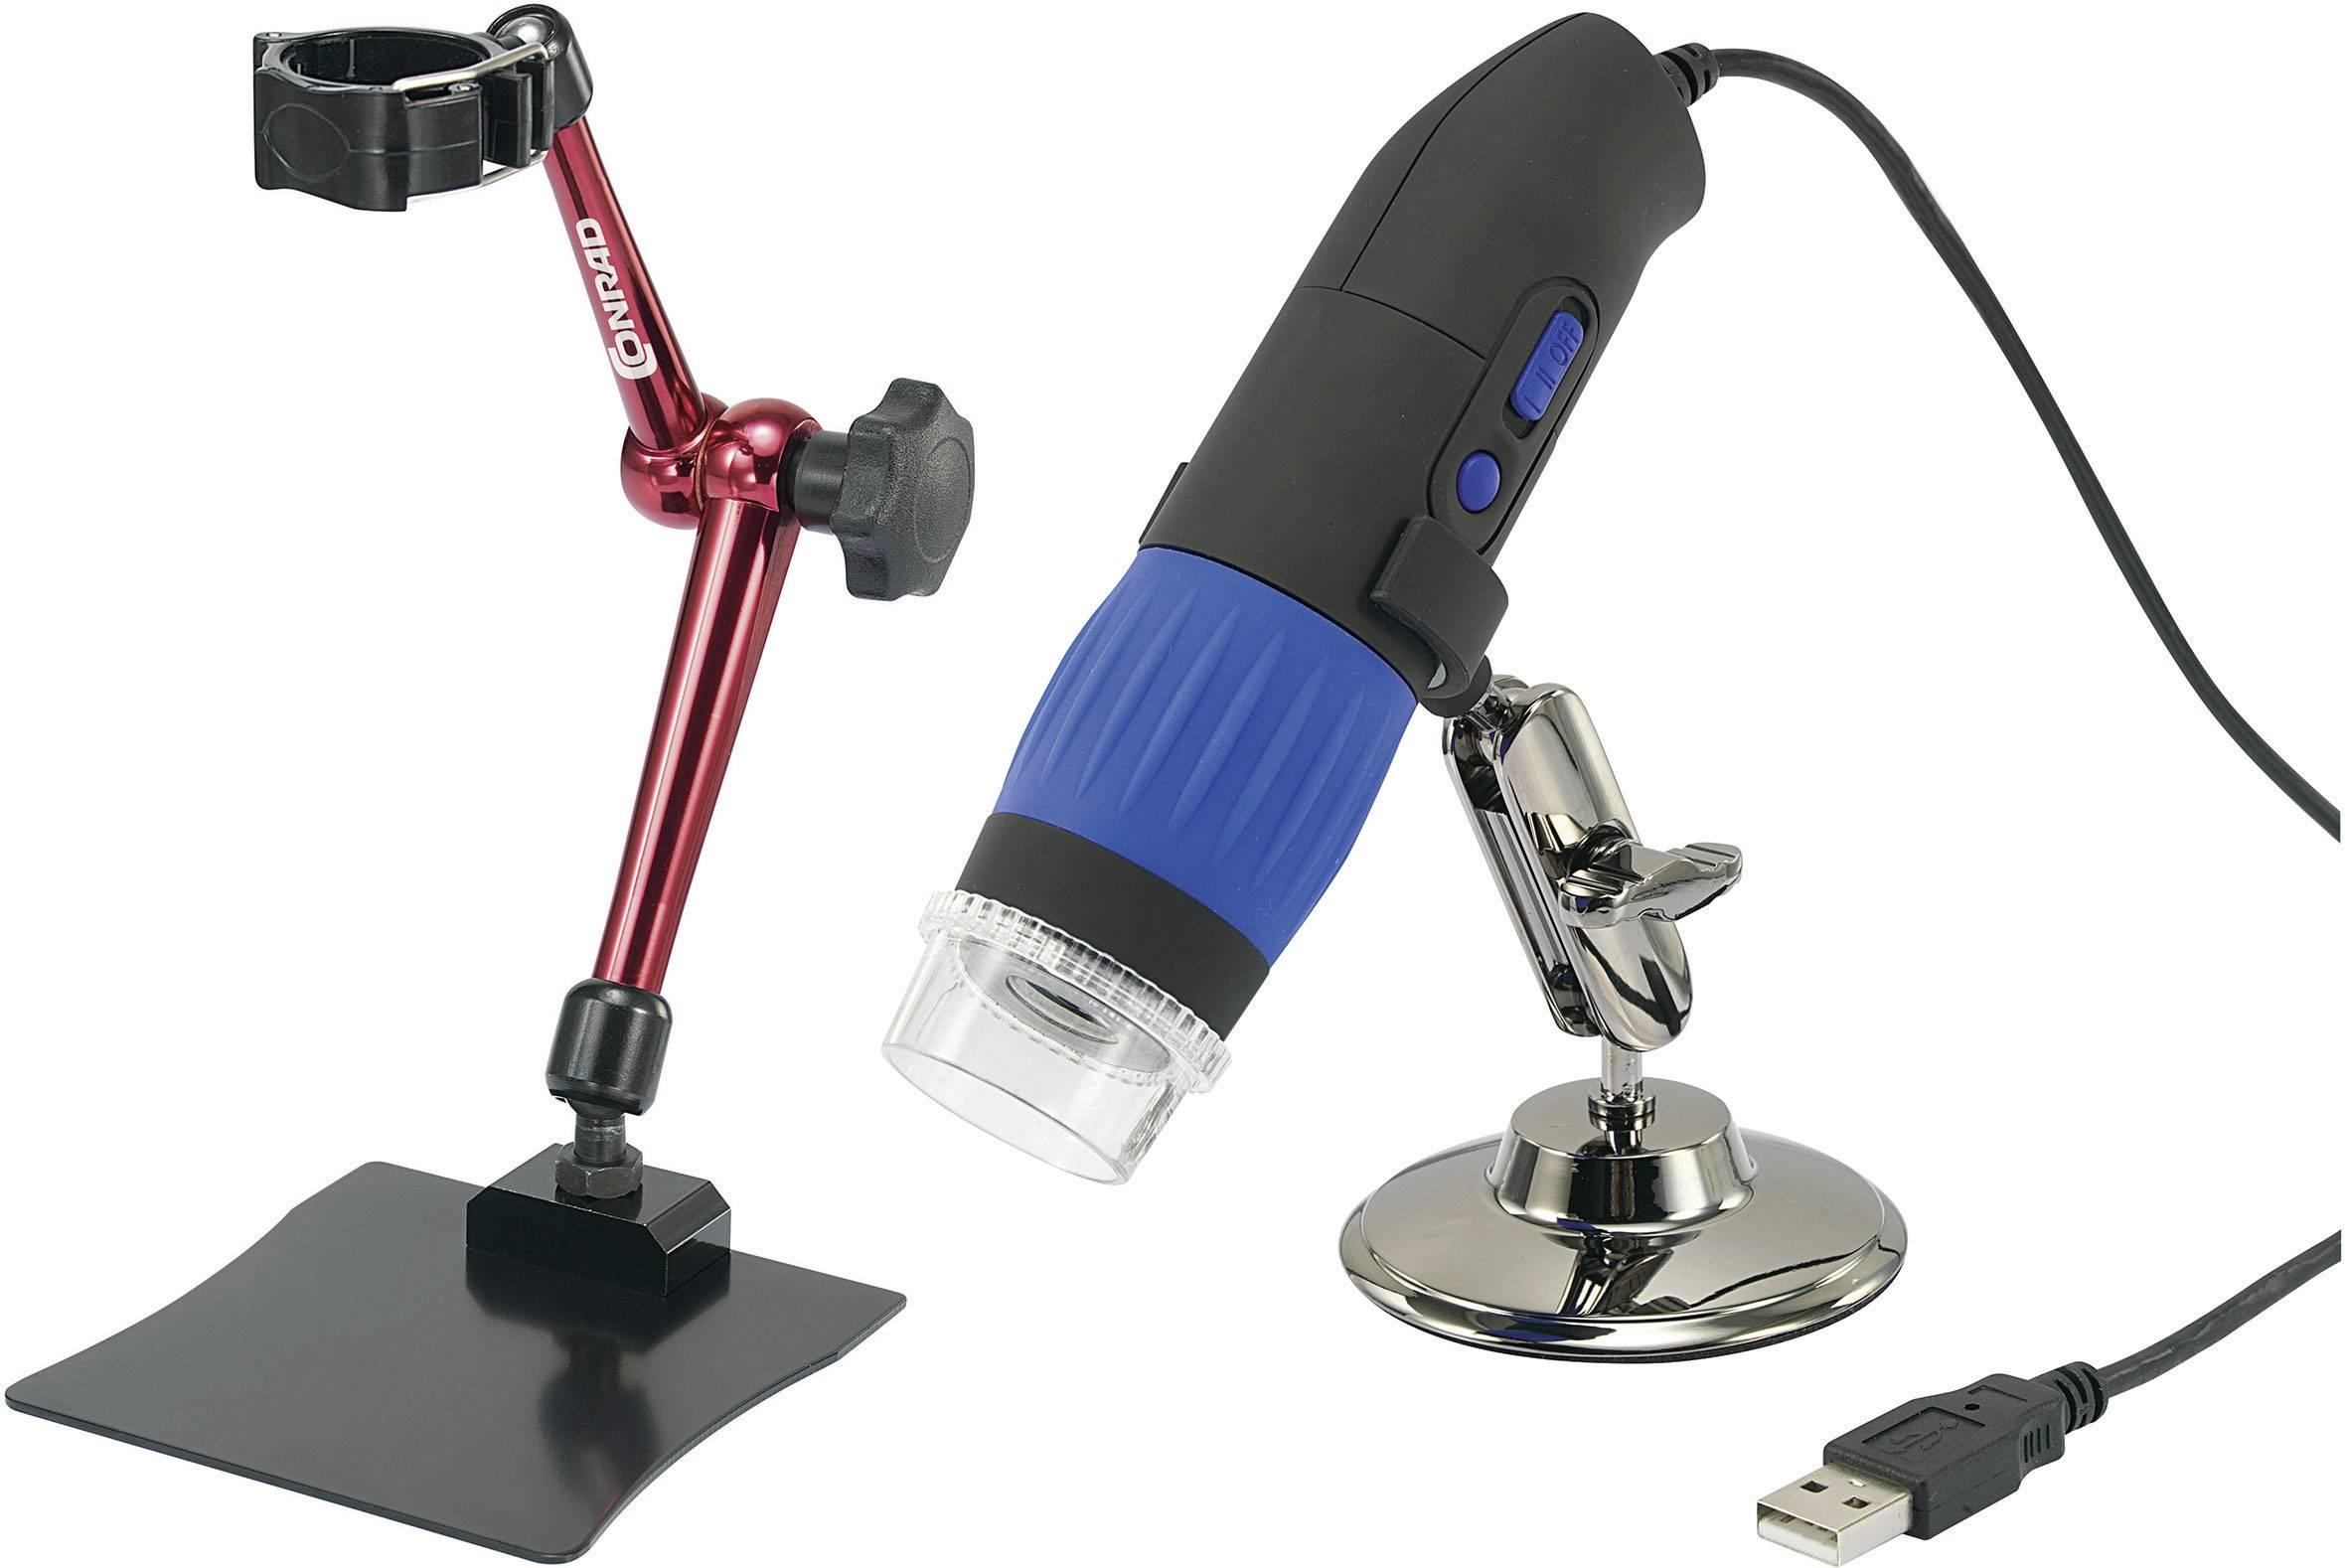 Sada mikroskopovej kamery USB 9 Mpx + 3D držiaku, DP-M14